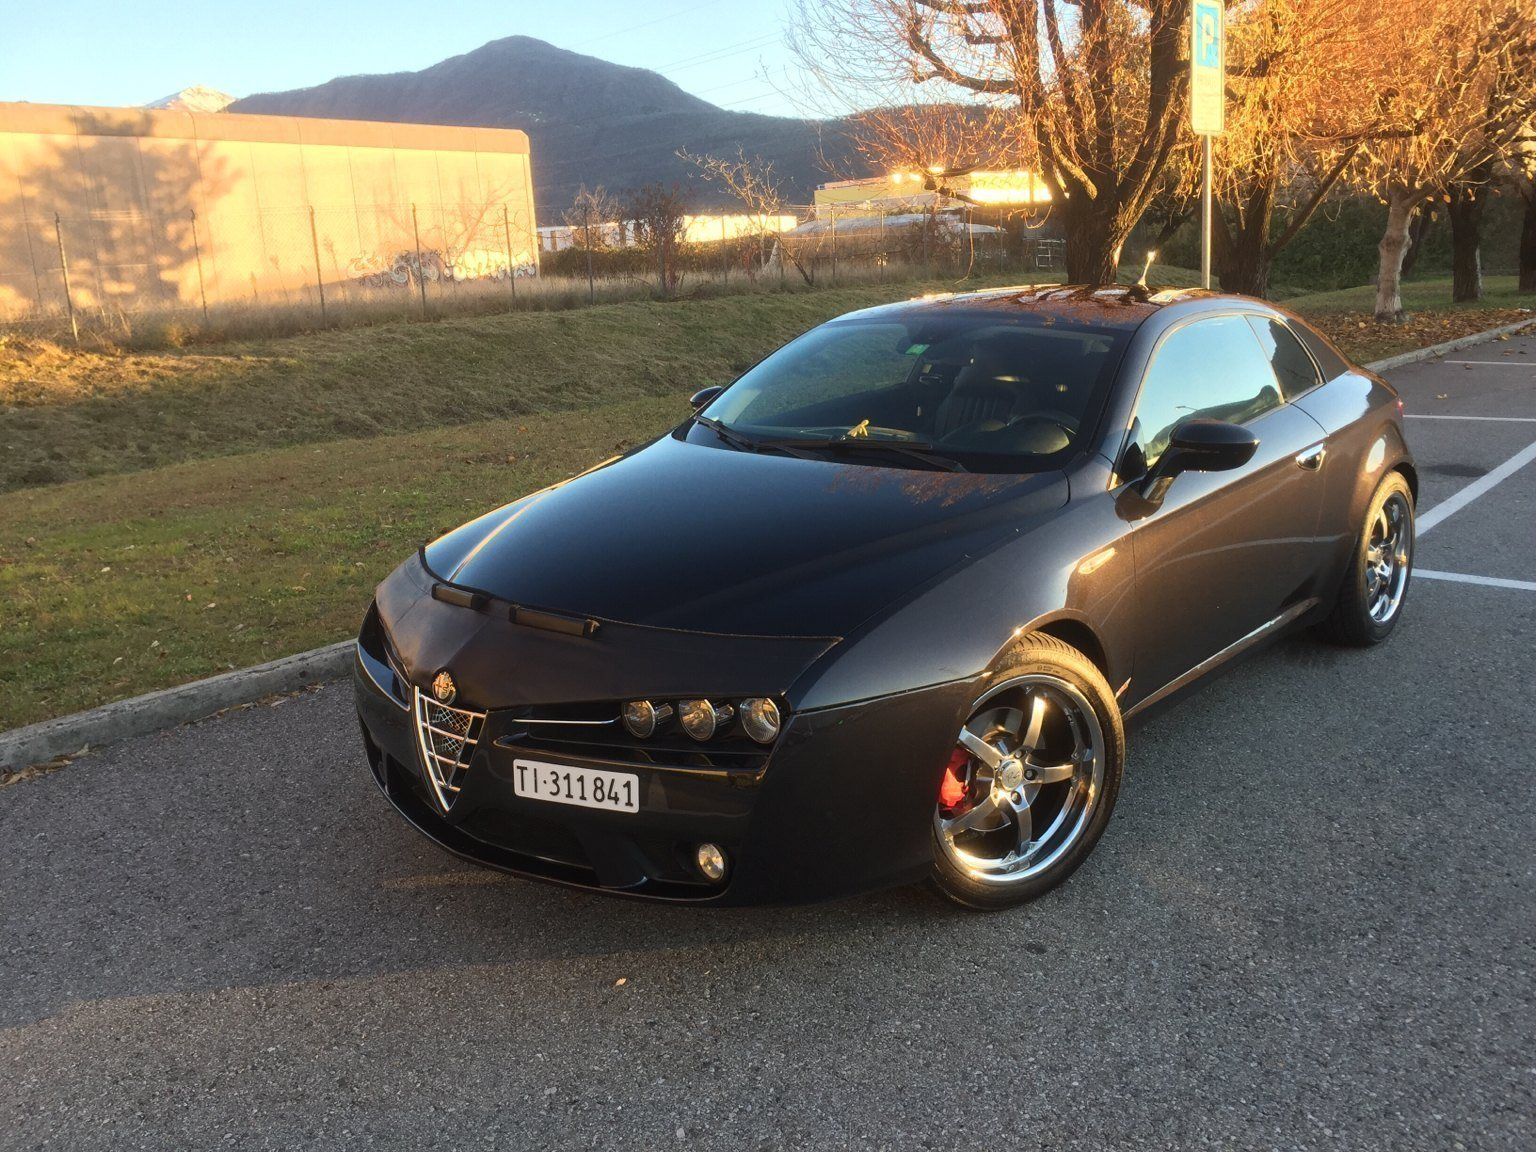 foto Alfa Romeo Brera - 2.2 jts 185cv - 1